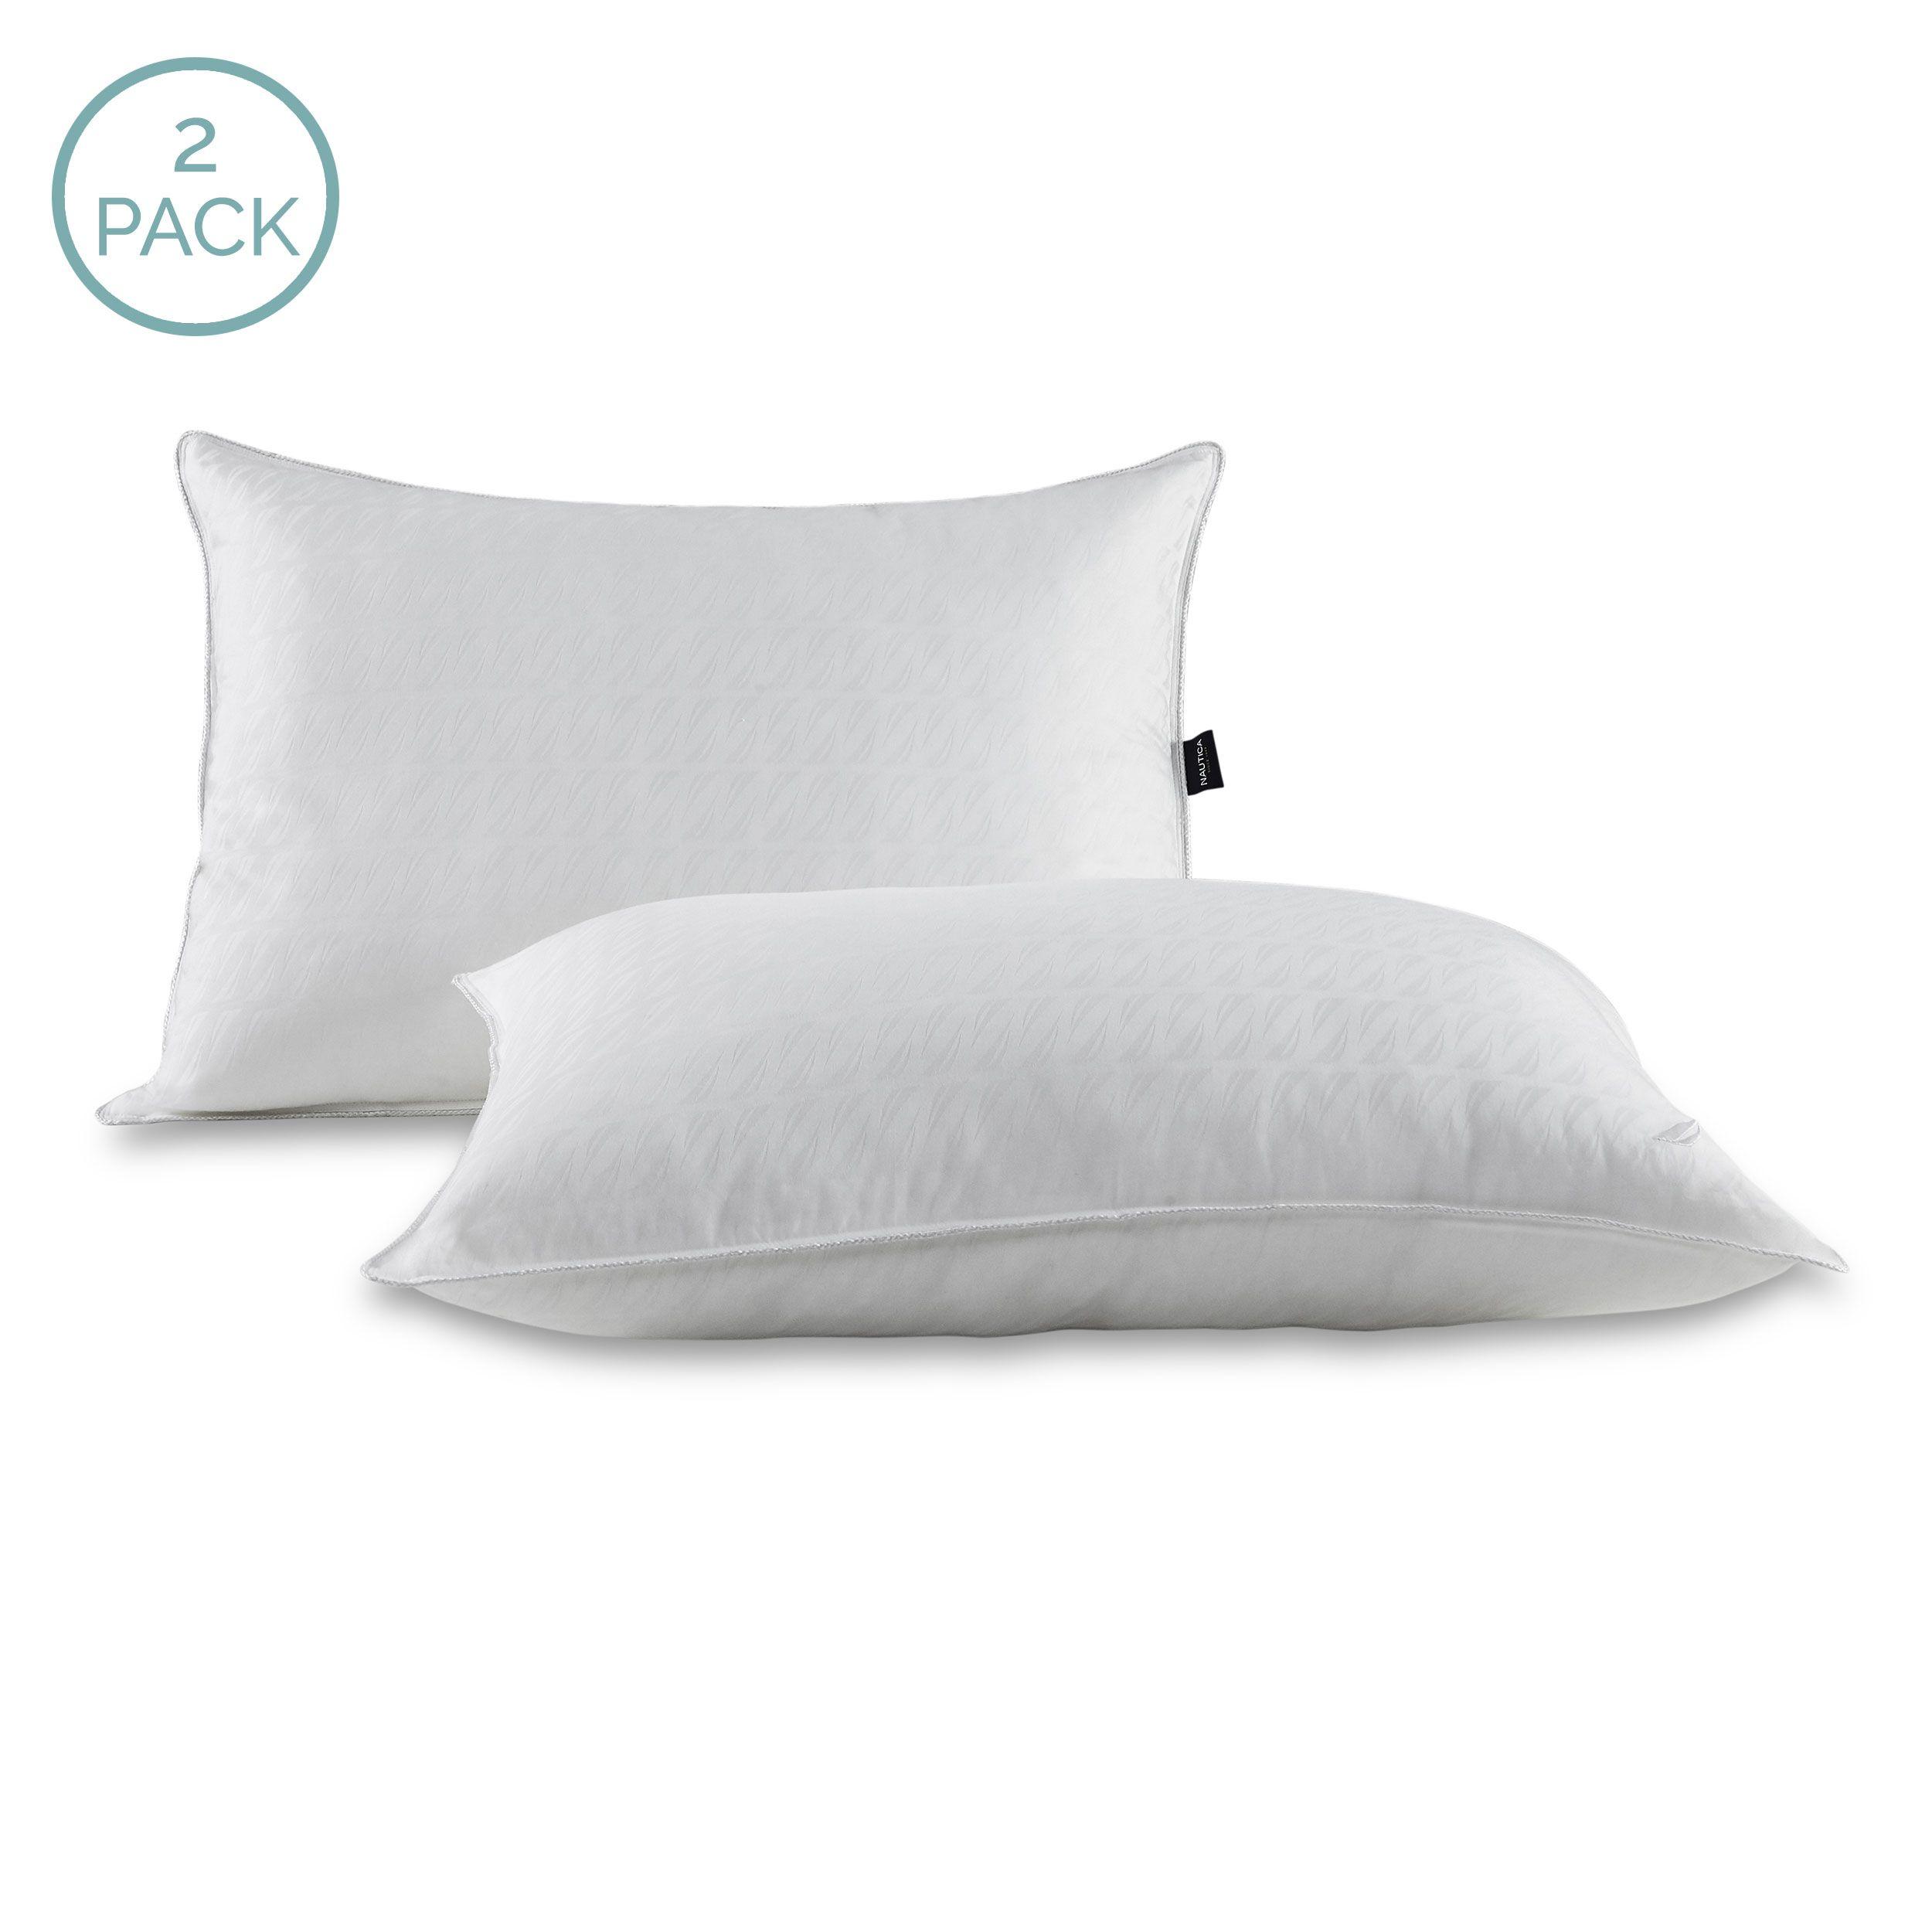 nautica down alternative pillow 2 pack